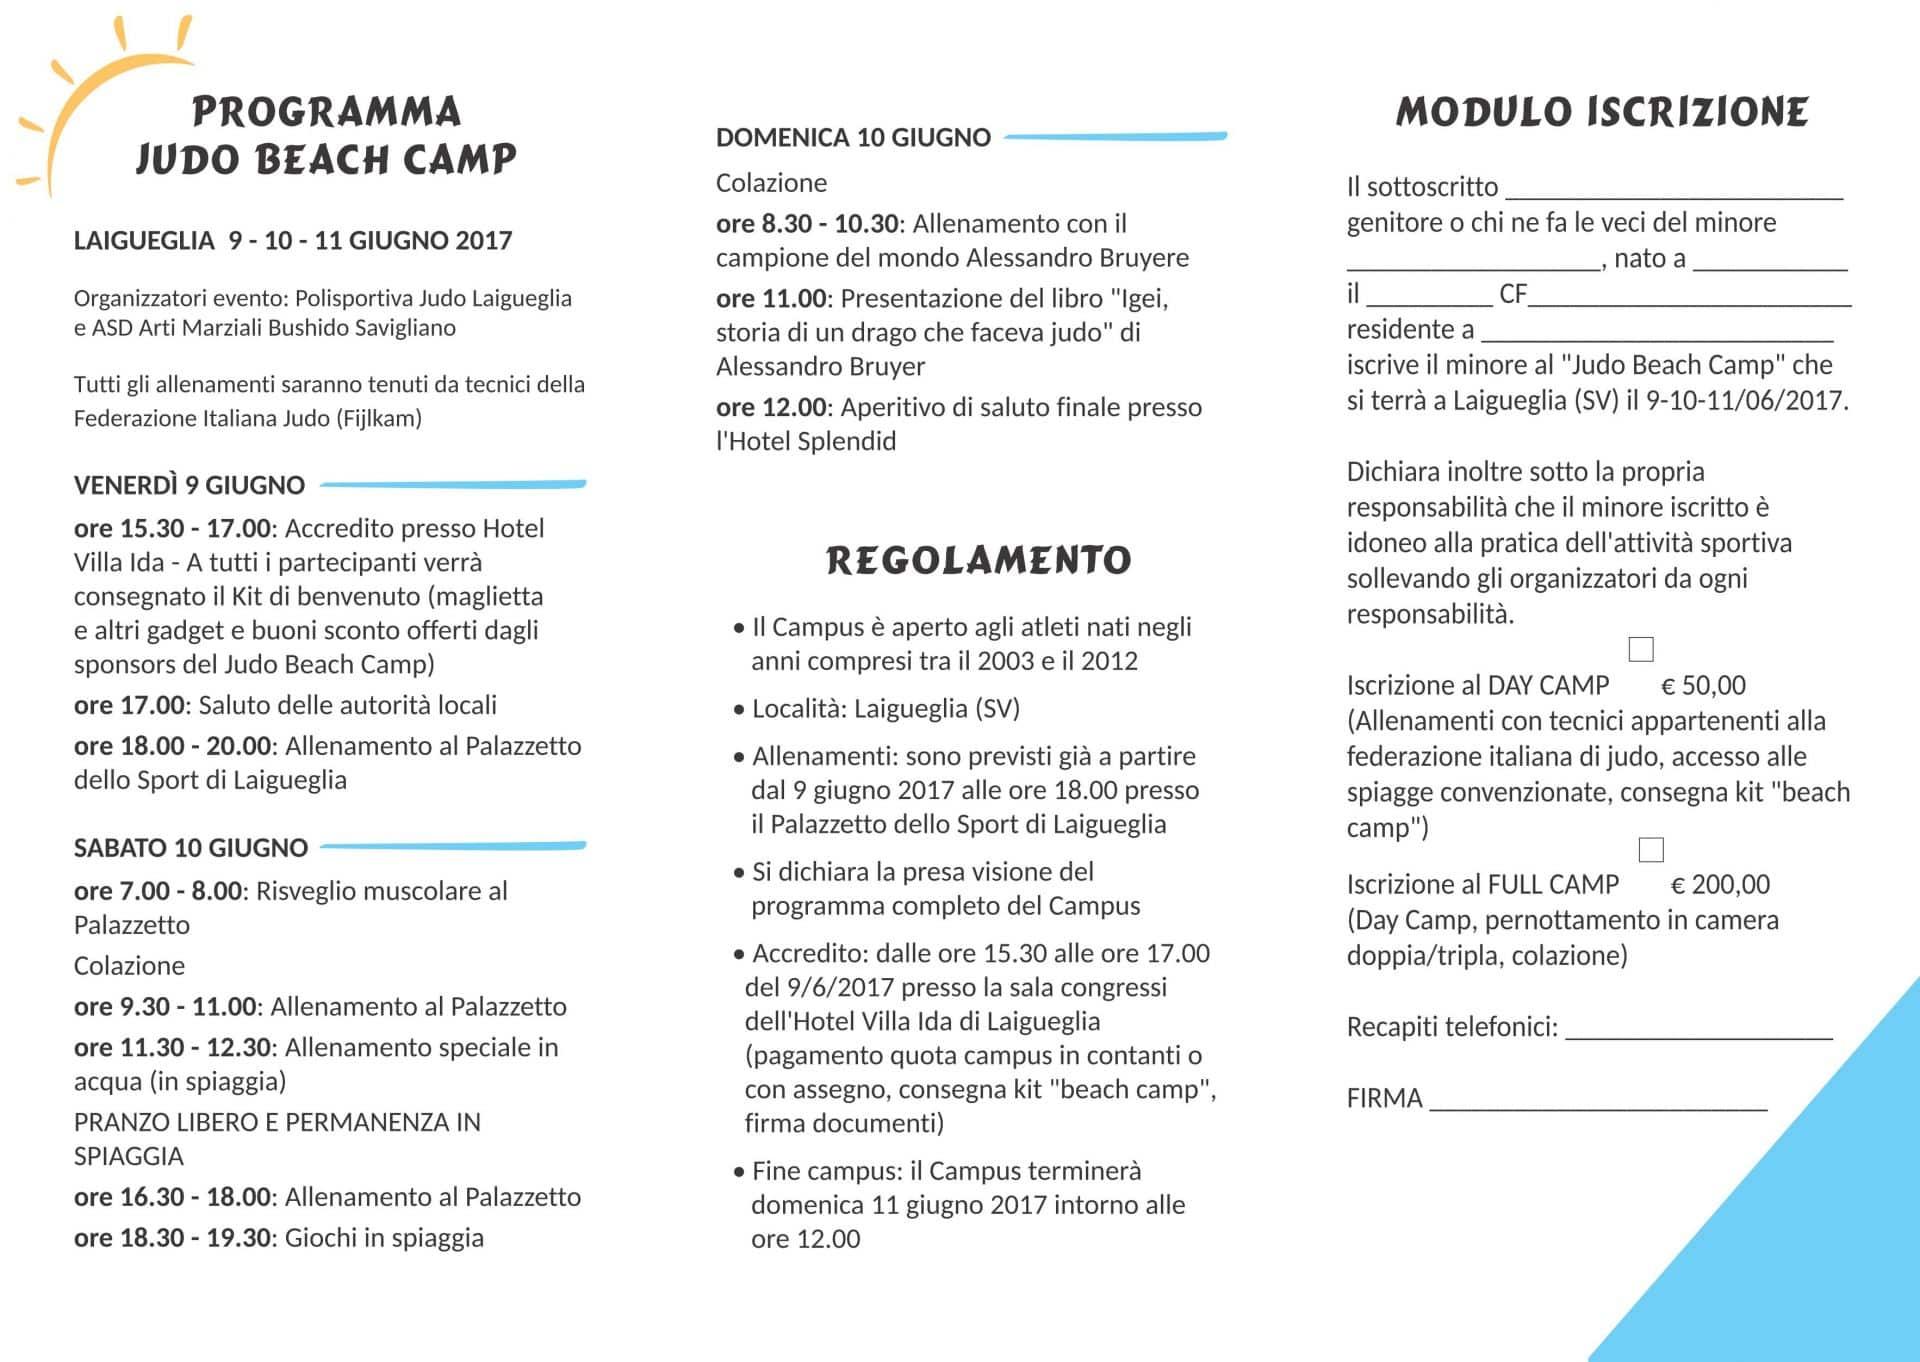 PolisportivaLaiguegliaJudo-BeachCamp-dépliant6f-A4-R-2